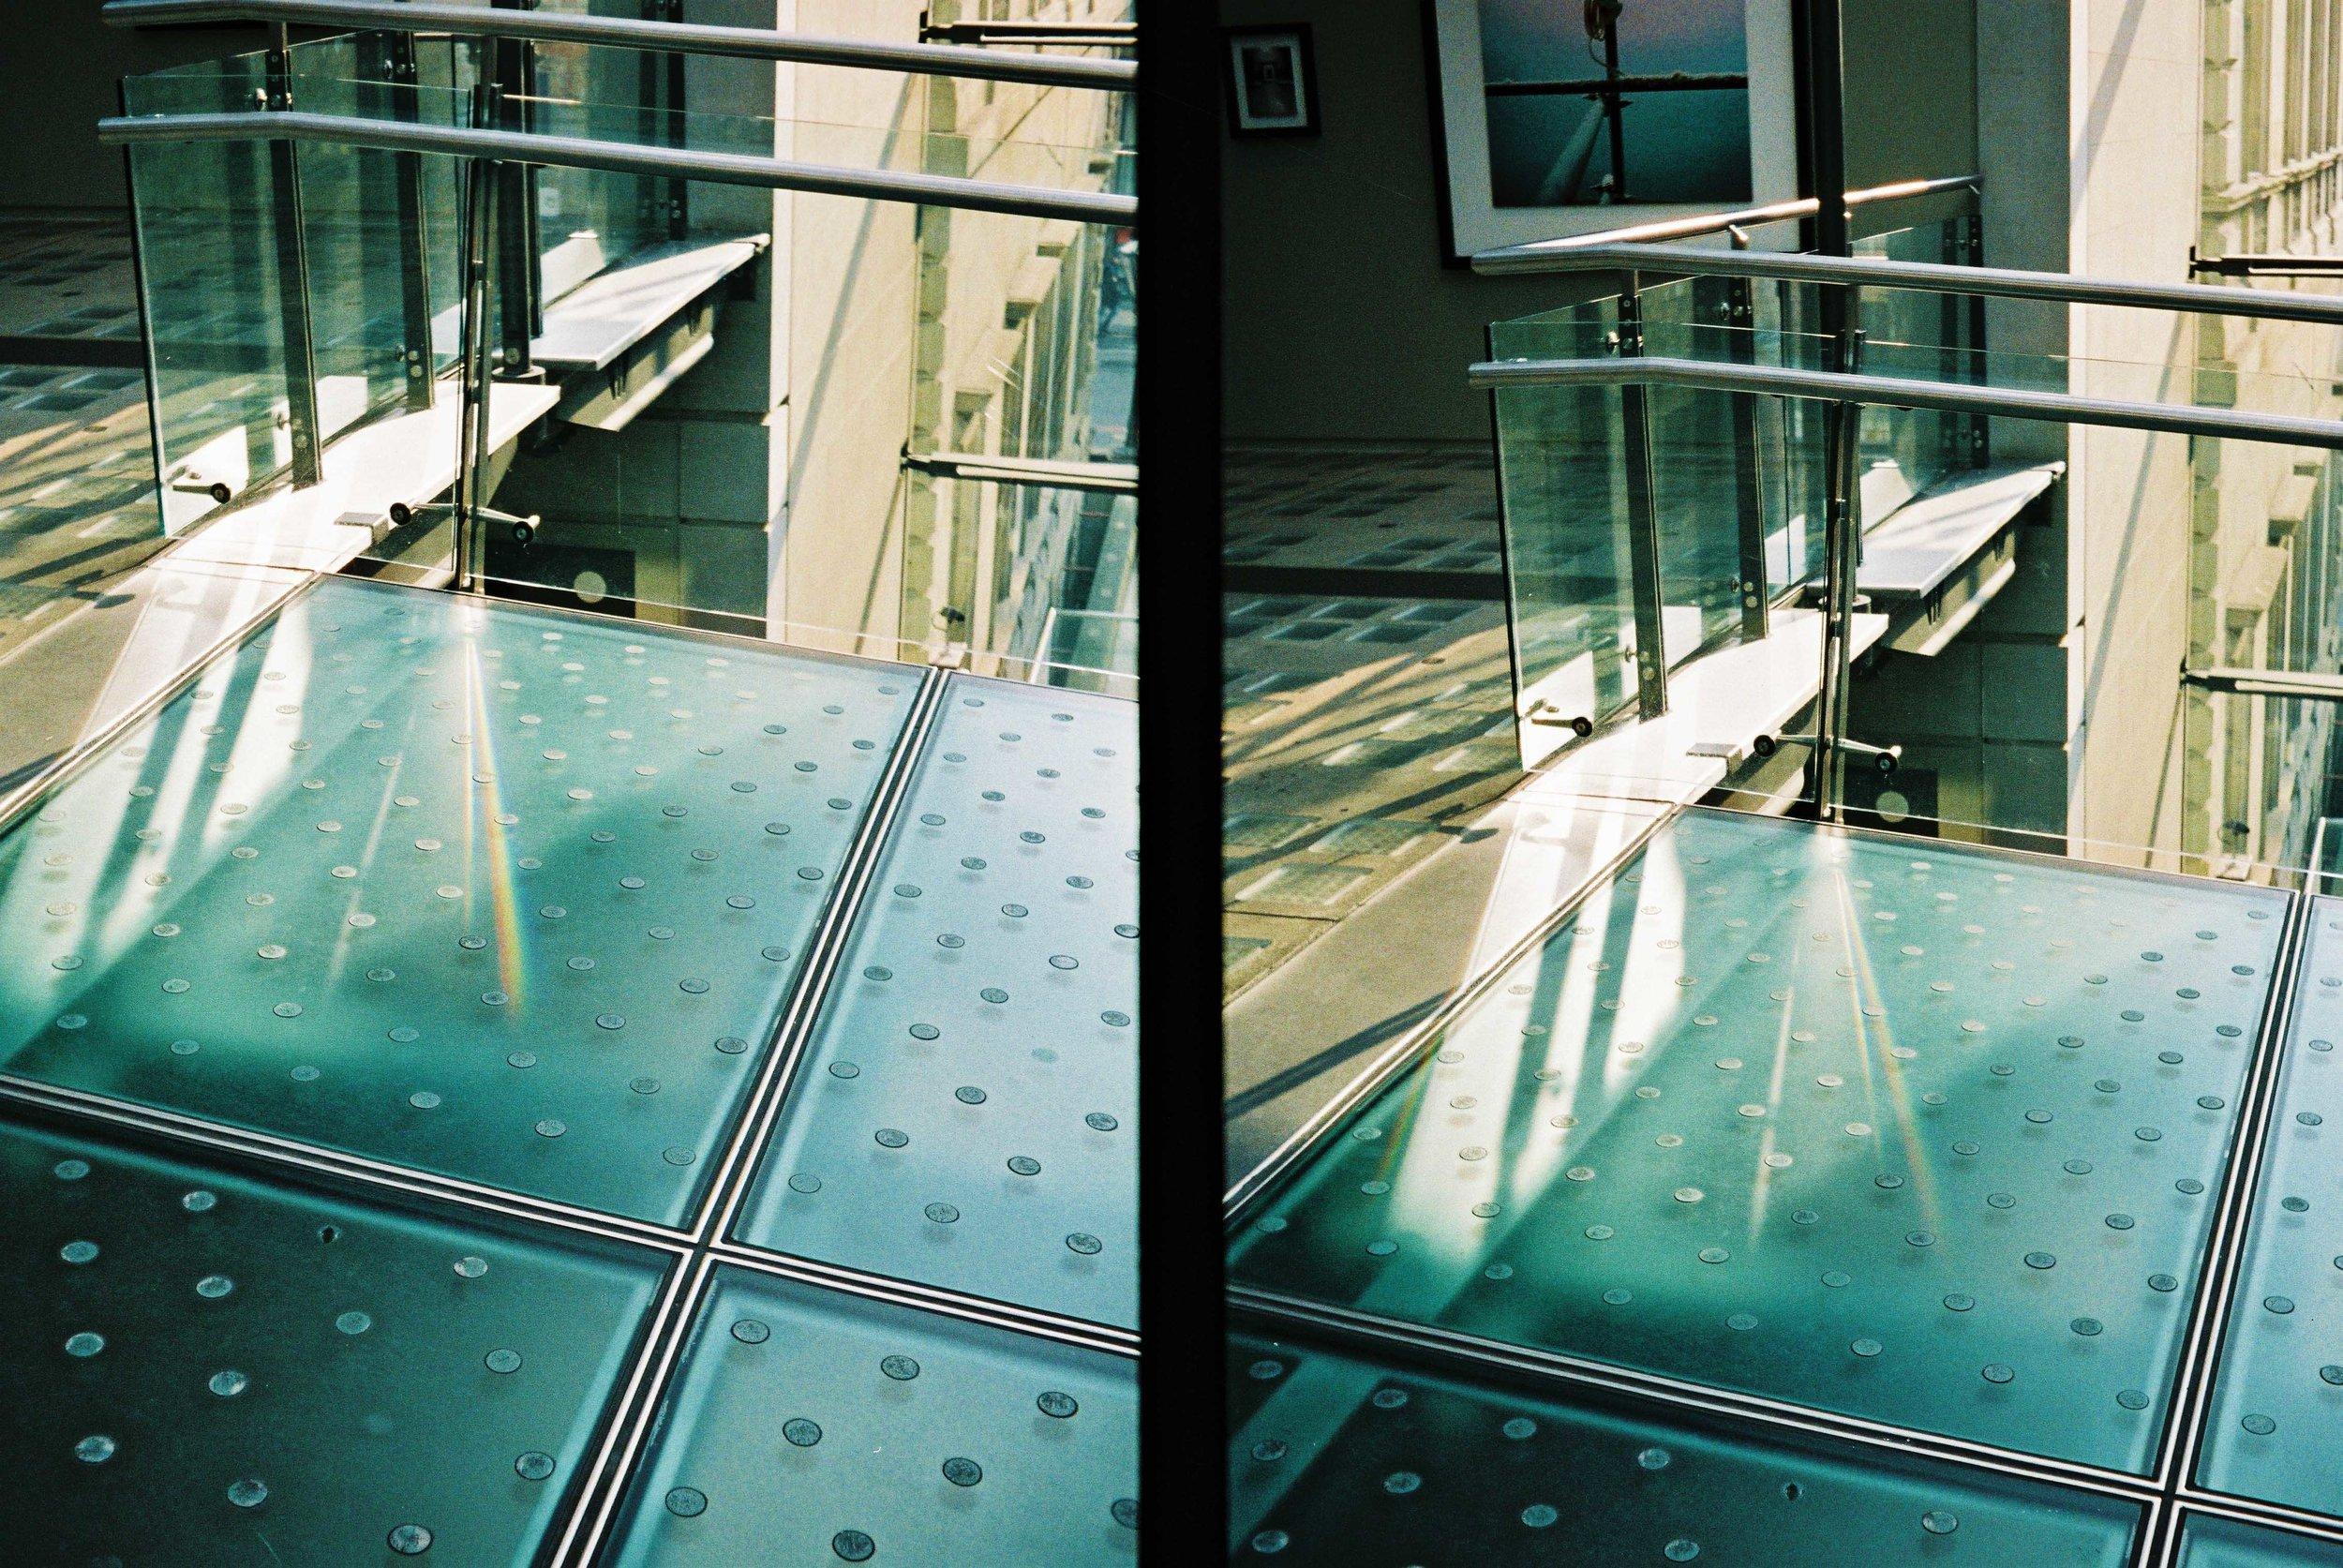 Gallery floor - olympus PEN half frame composition